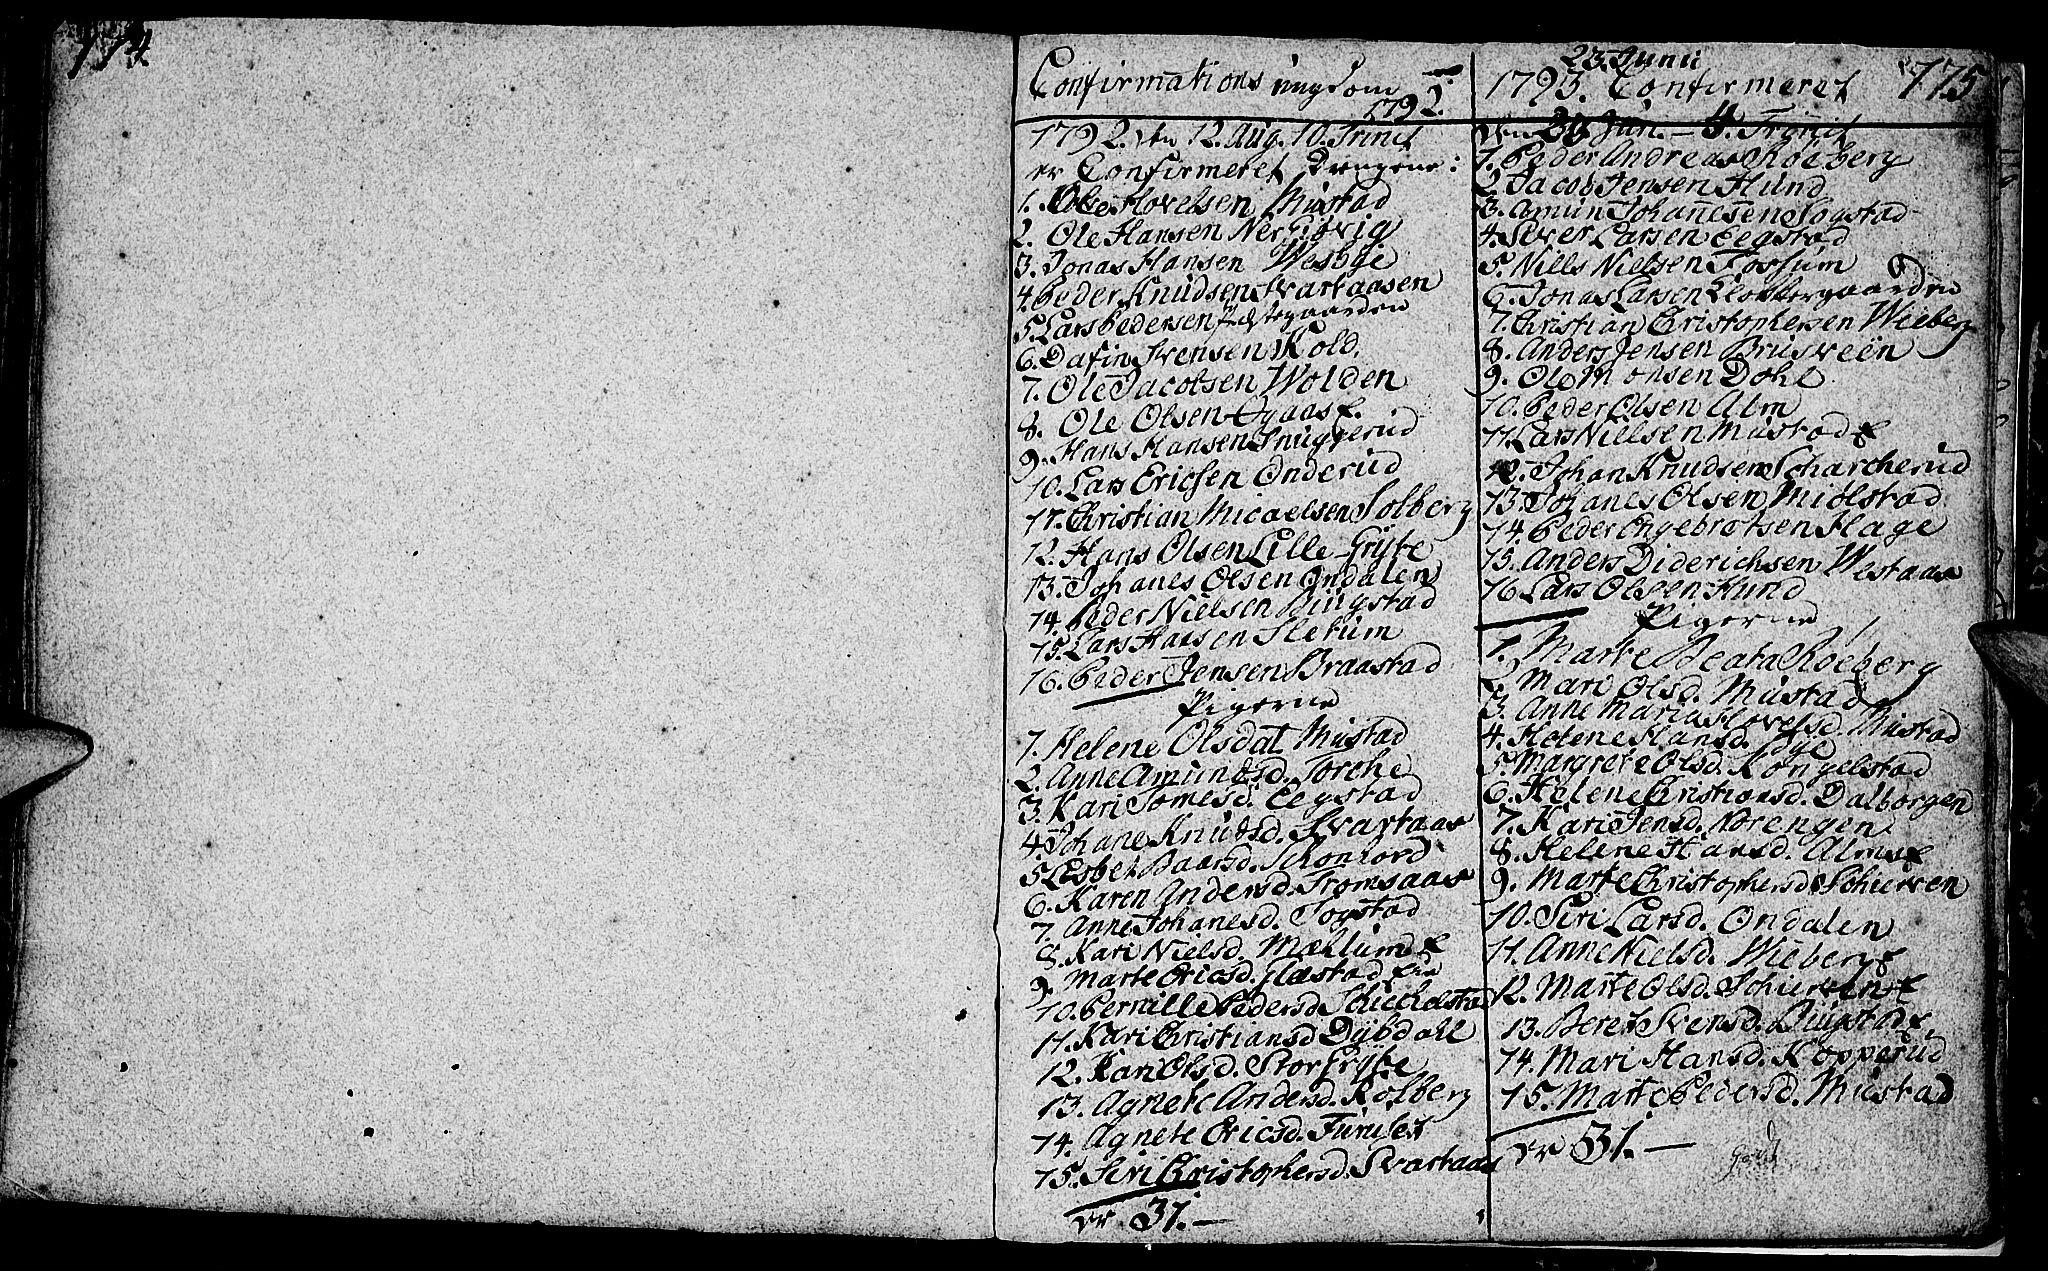 SAH, Vardal prestekontor, H/Ha/Hab/L0002: Klokkerbok nr. 2, 1790-1803, s. 174-175